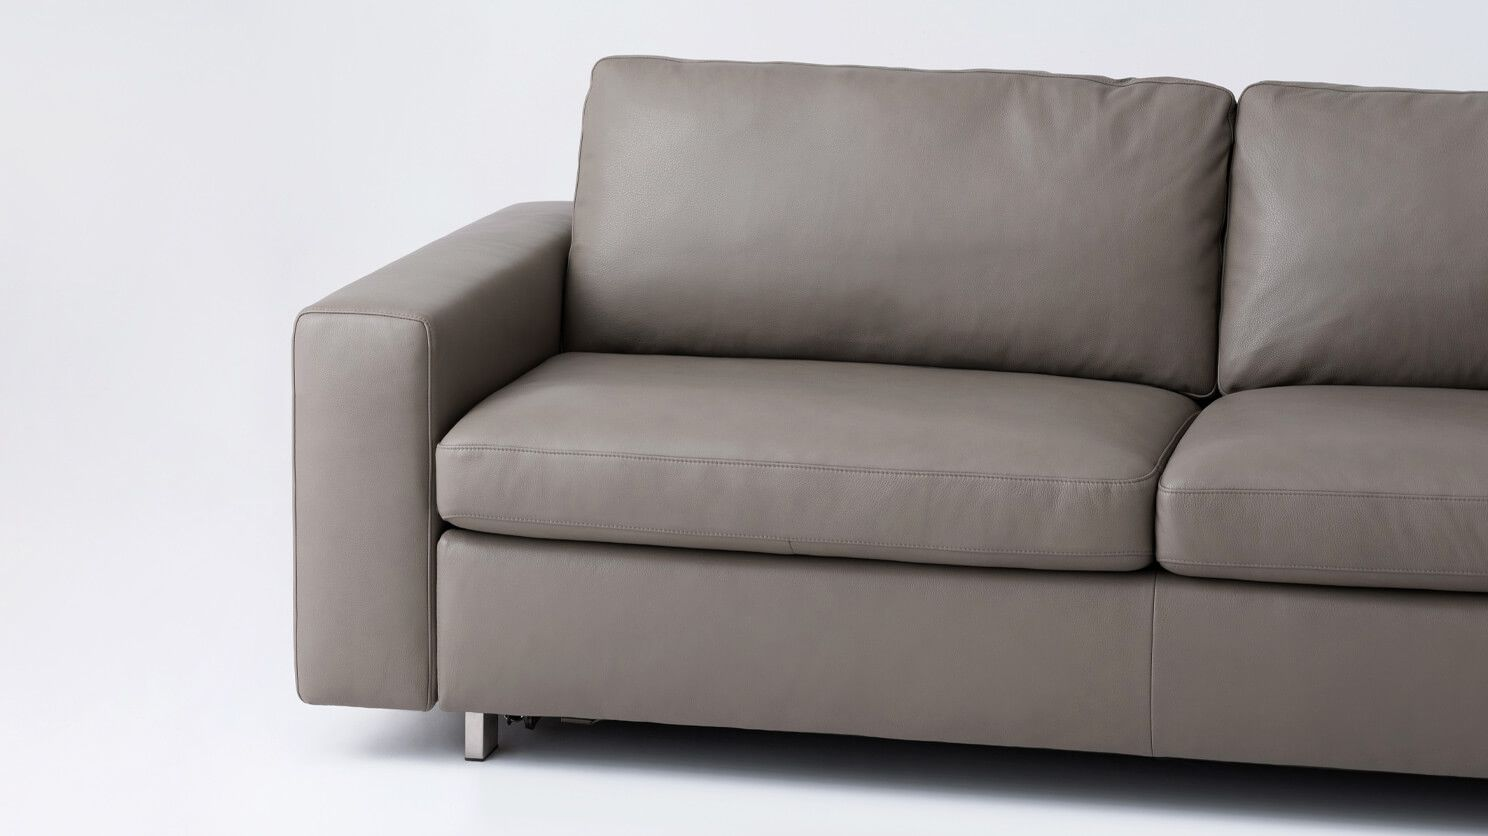 Reva 2 Piece Sectional Sleeper Sofa With Storage Chaise Sectional Sleeper Sofa Sleeper Sofa Sofa